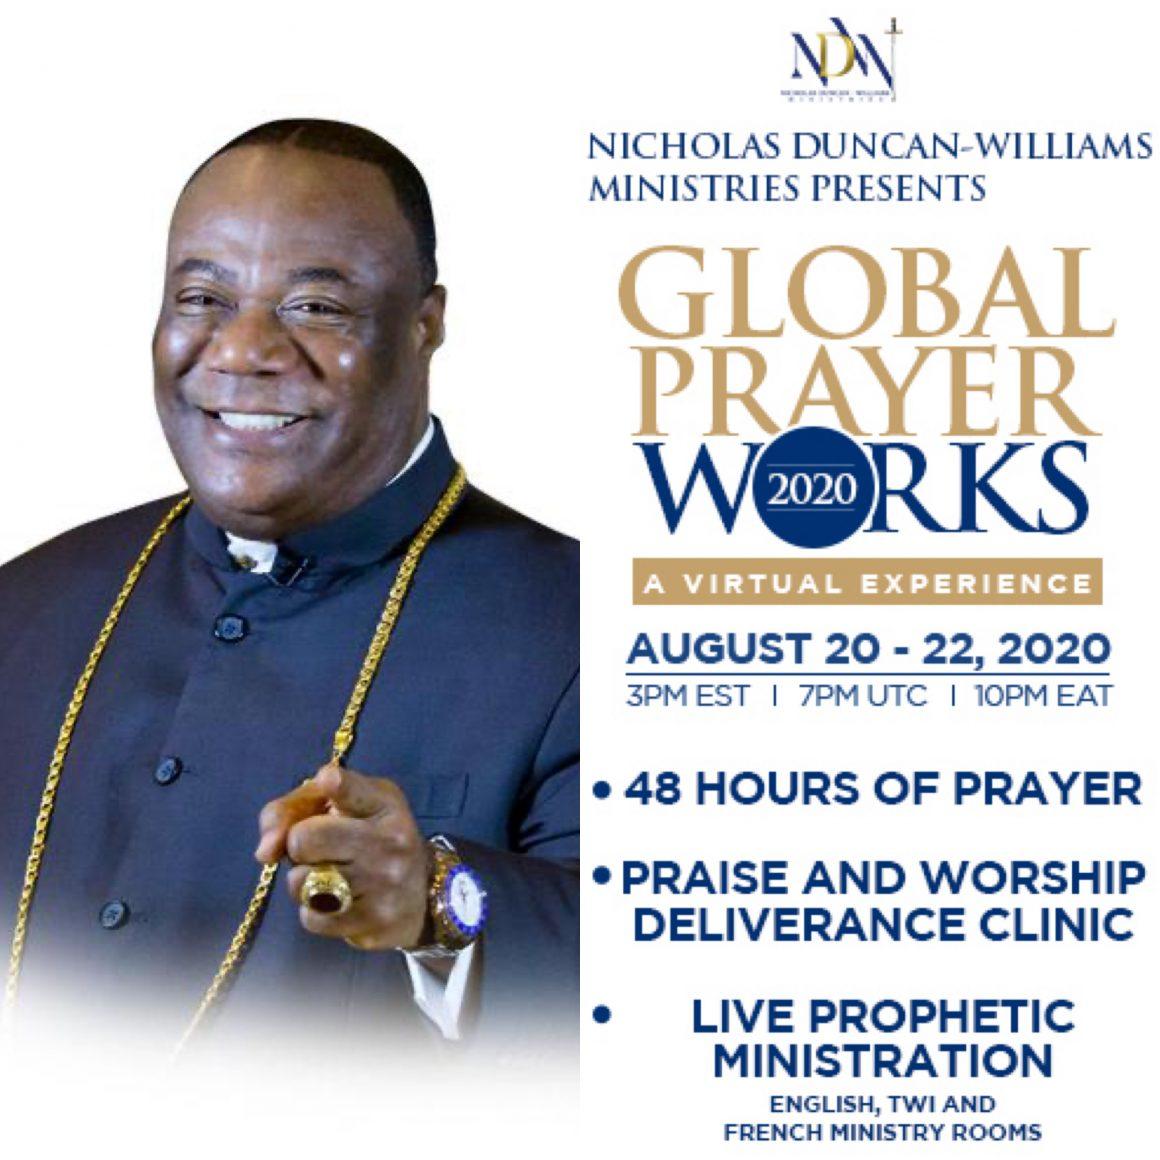 duncan-williams-ministries-set-to-host-'global-prayer-works'-virtual-summit